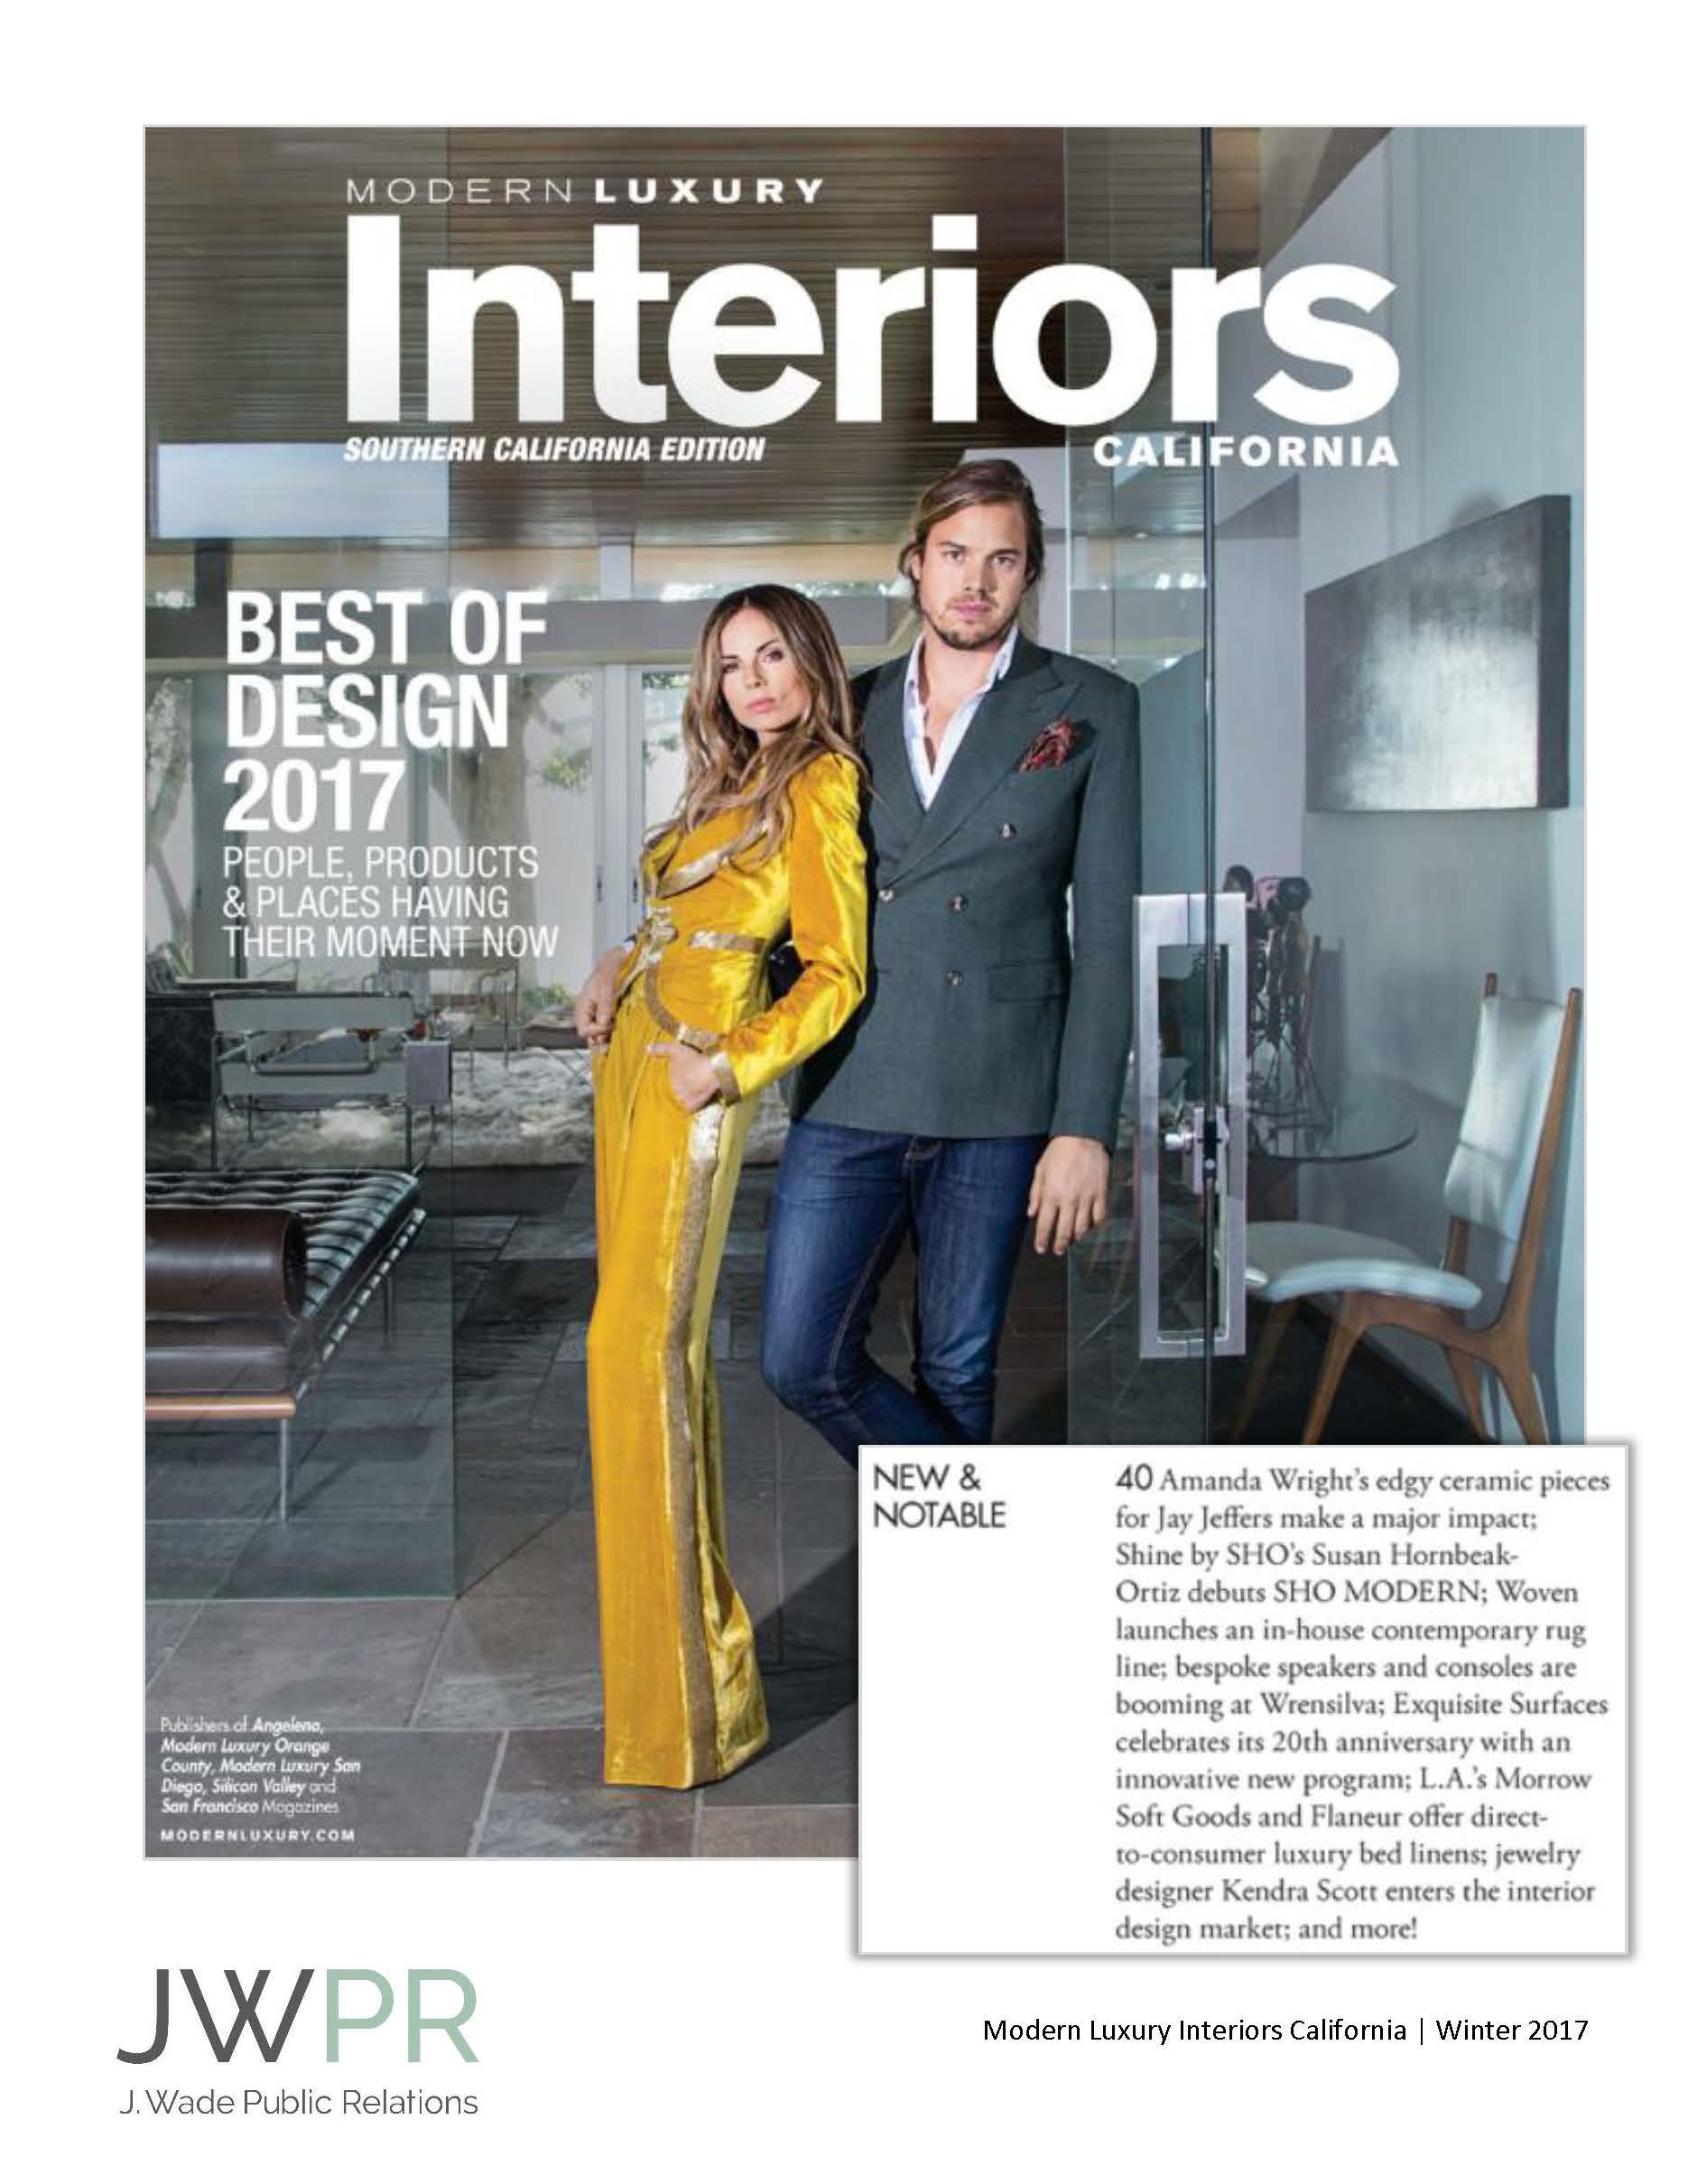 Modern Luxury Interiors California Winter 2017[2]_Page_1.jpg